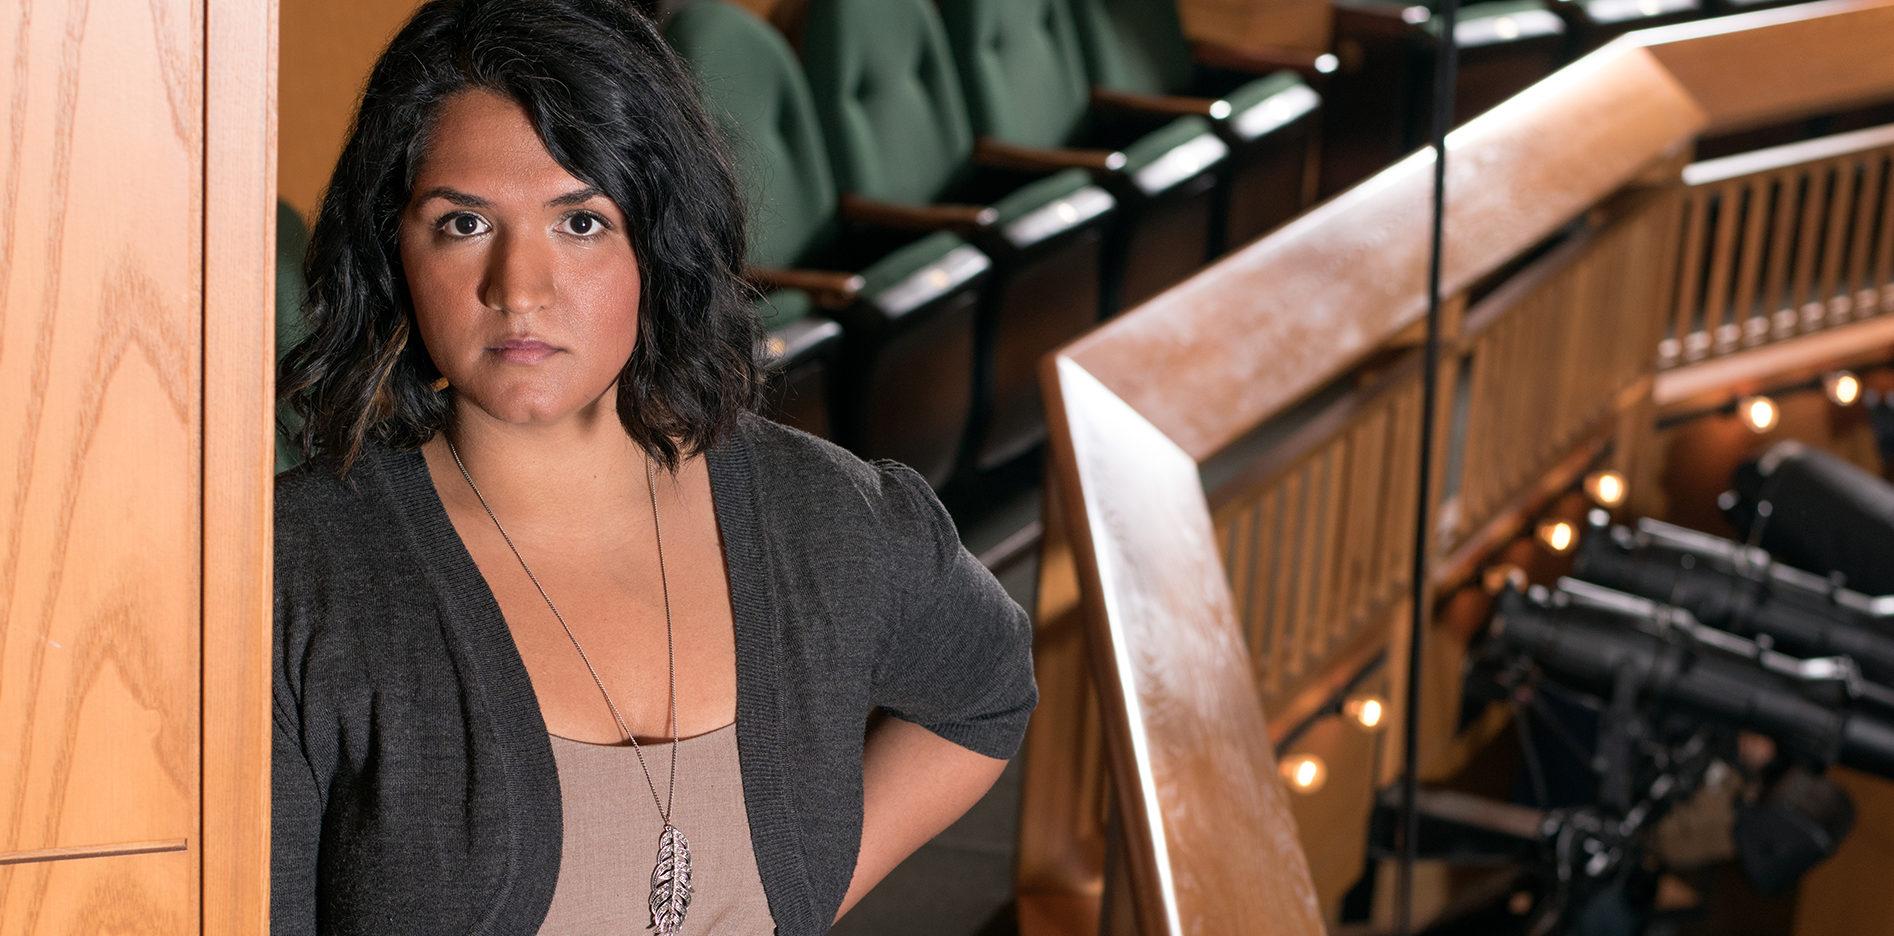 Spiel Chicago Episode Seventeen: Lavina Jadhwani